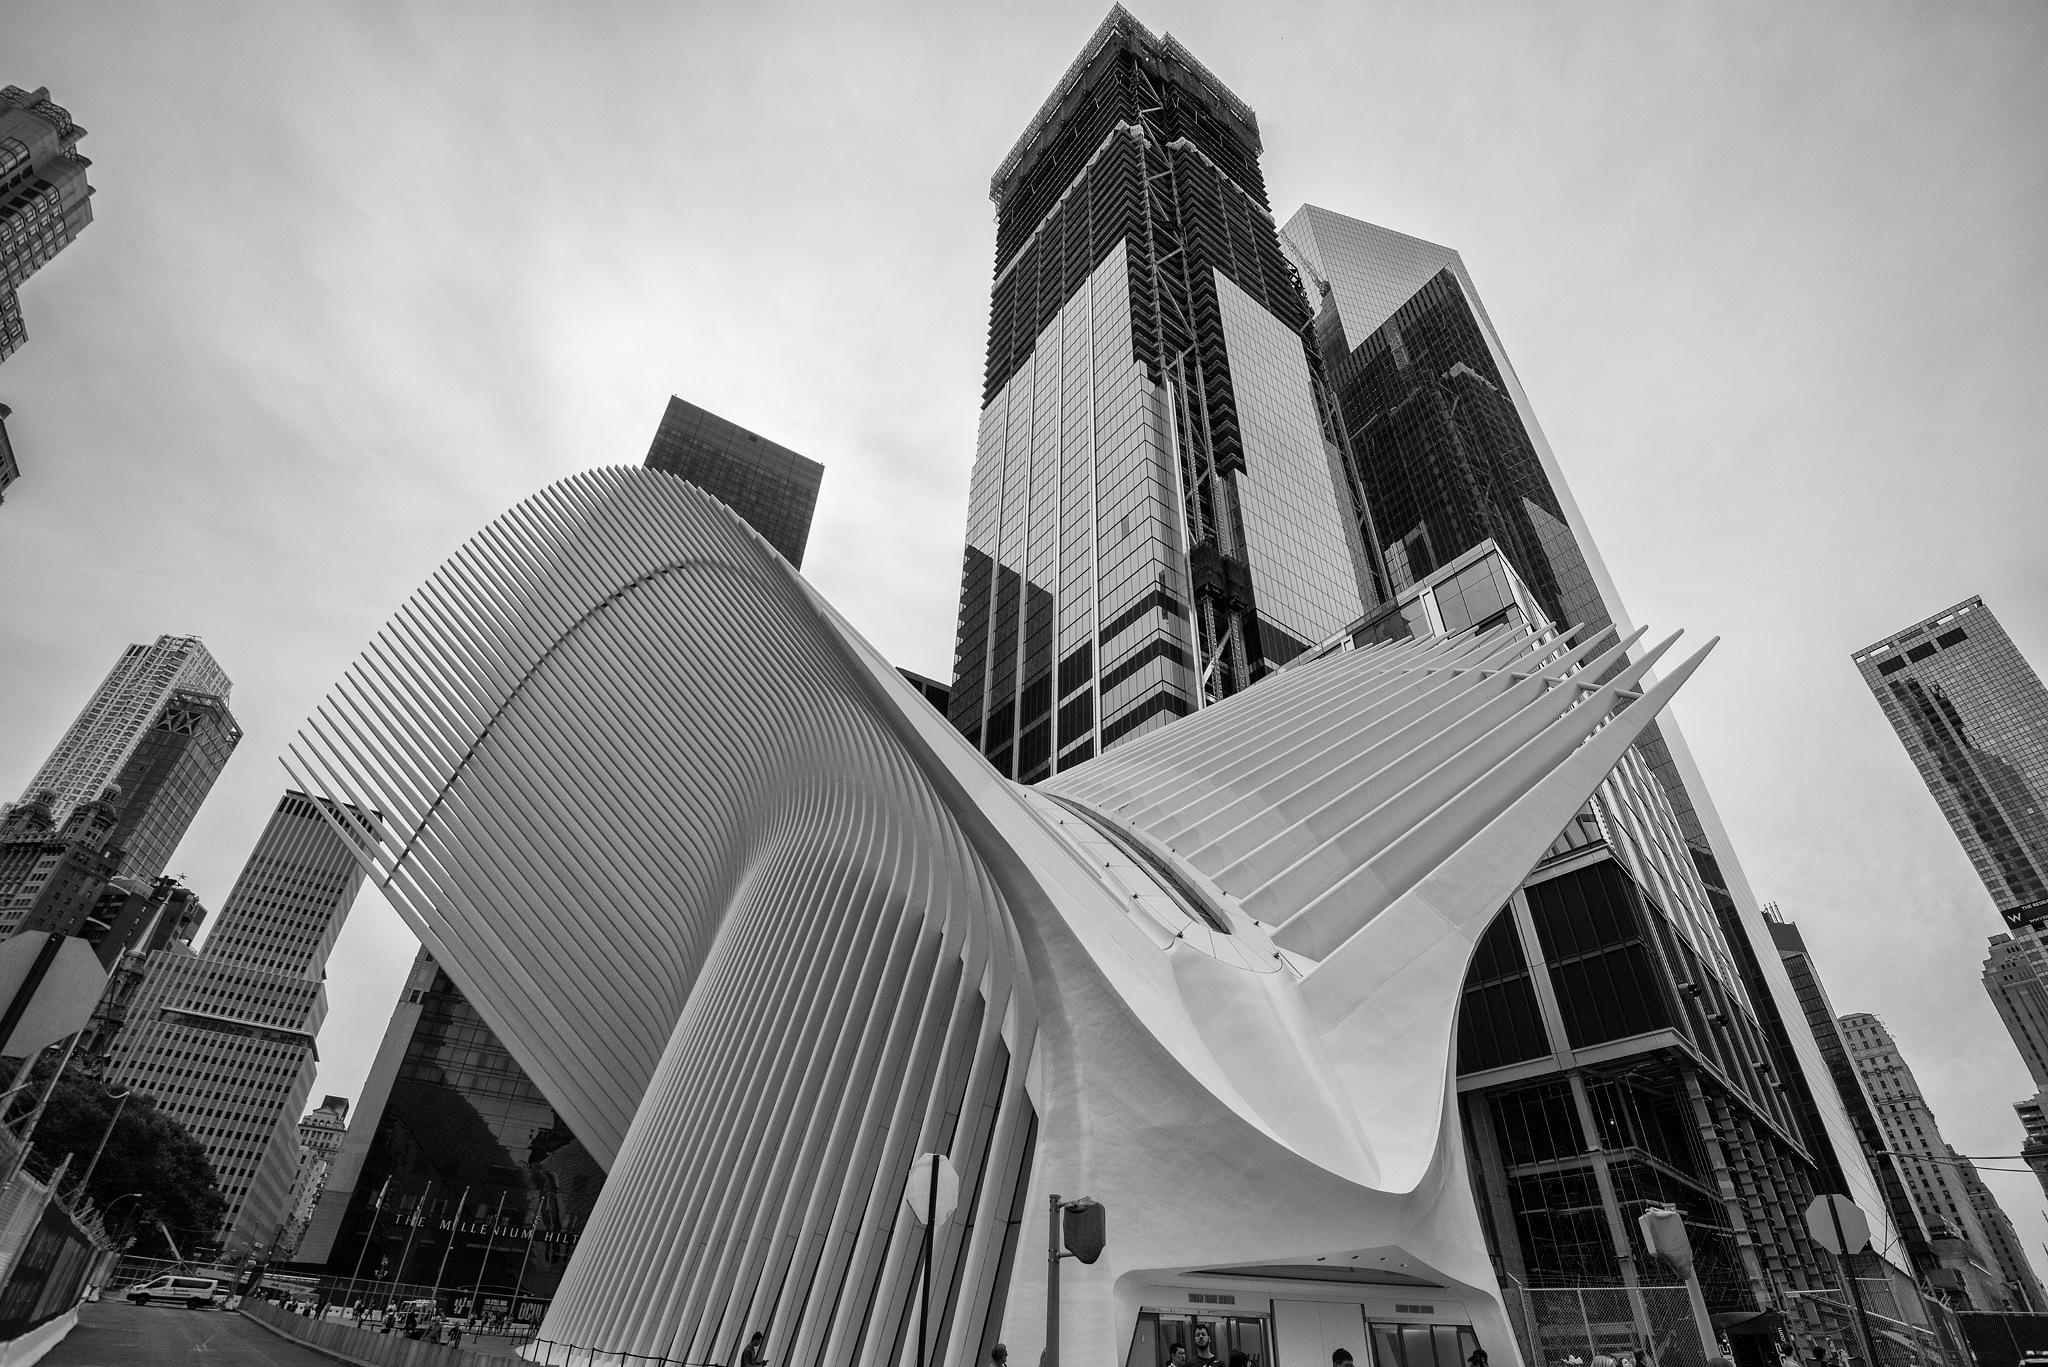 New York, September, 2016 by desmcmahon5